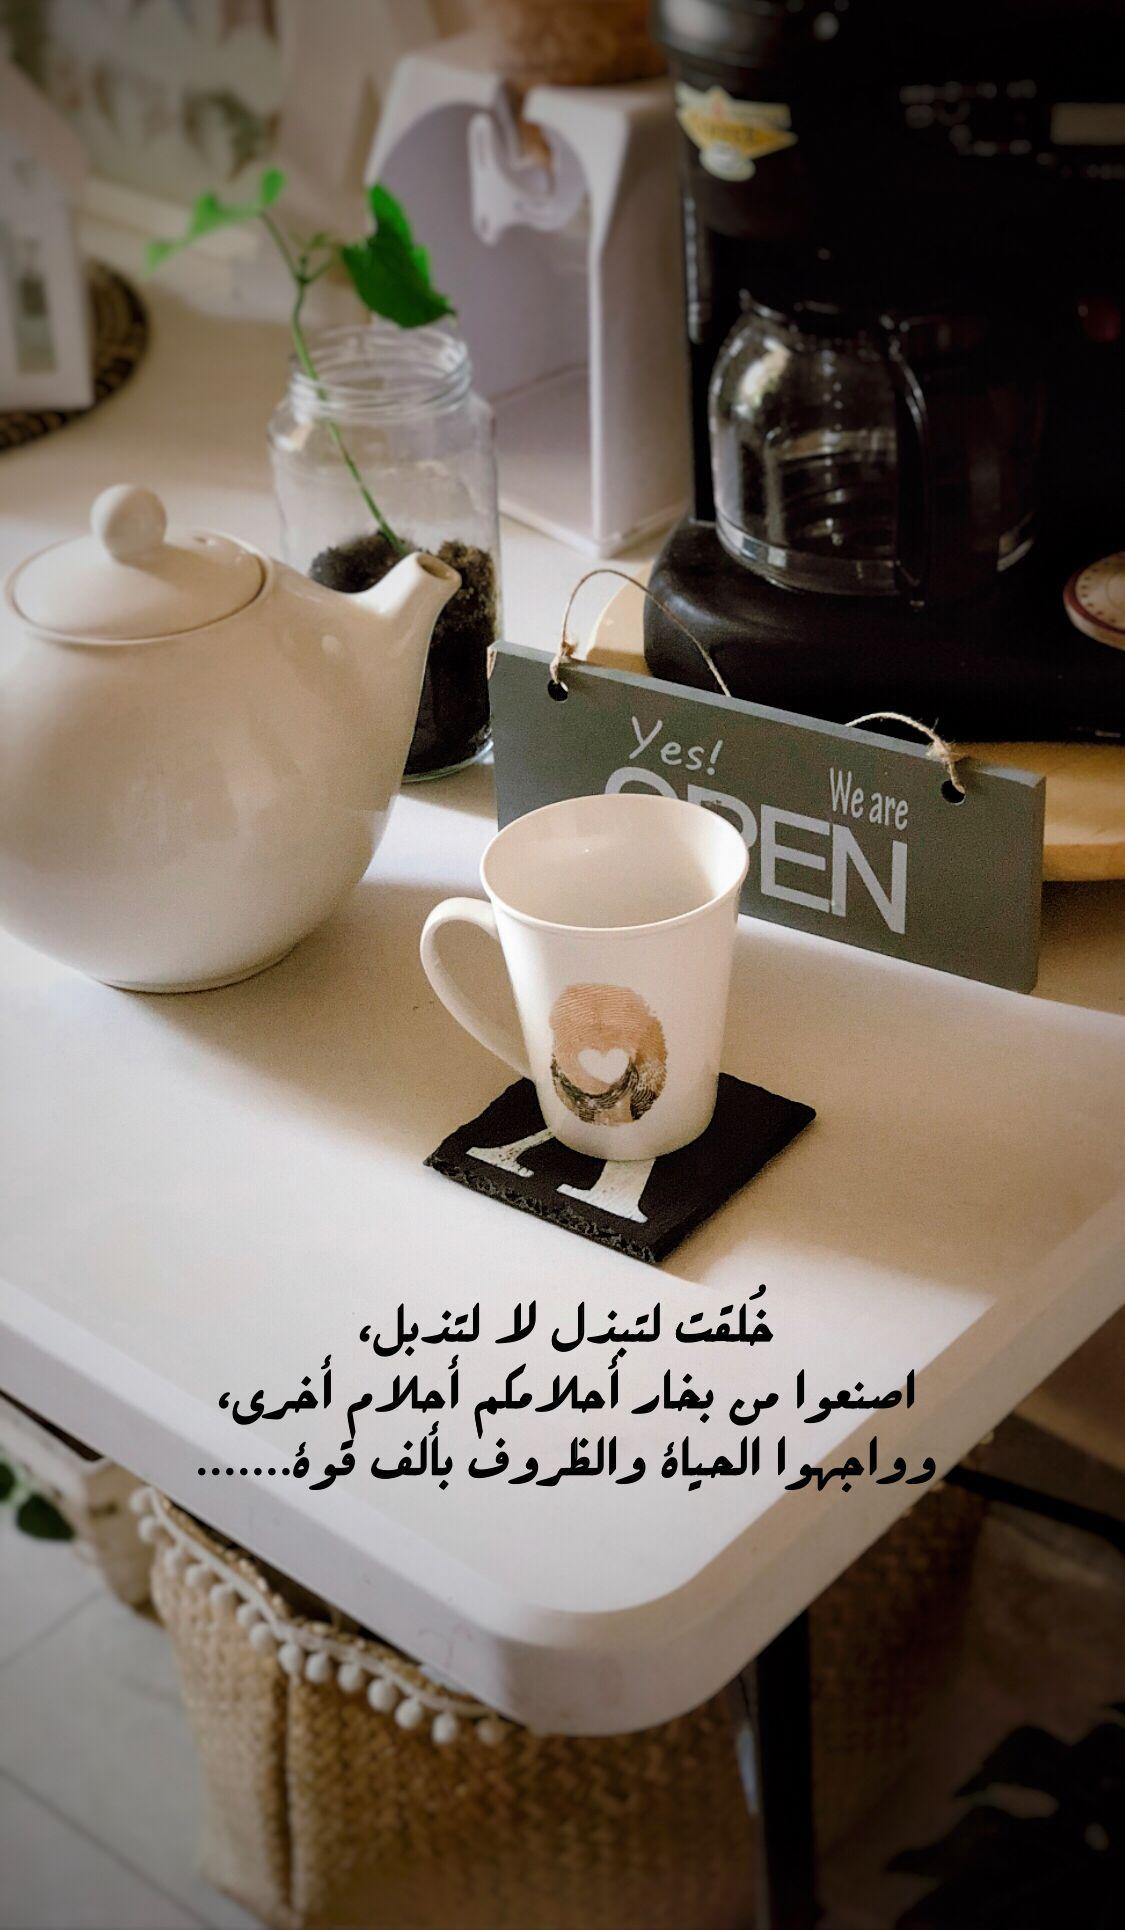 صباح الخير Spoken Word Poetry Poems Positive Notes Arabic Typing